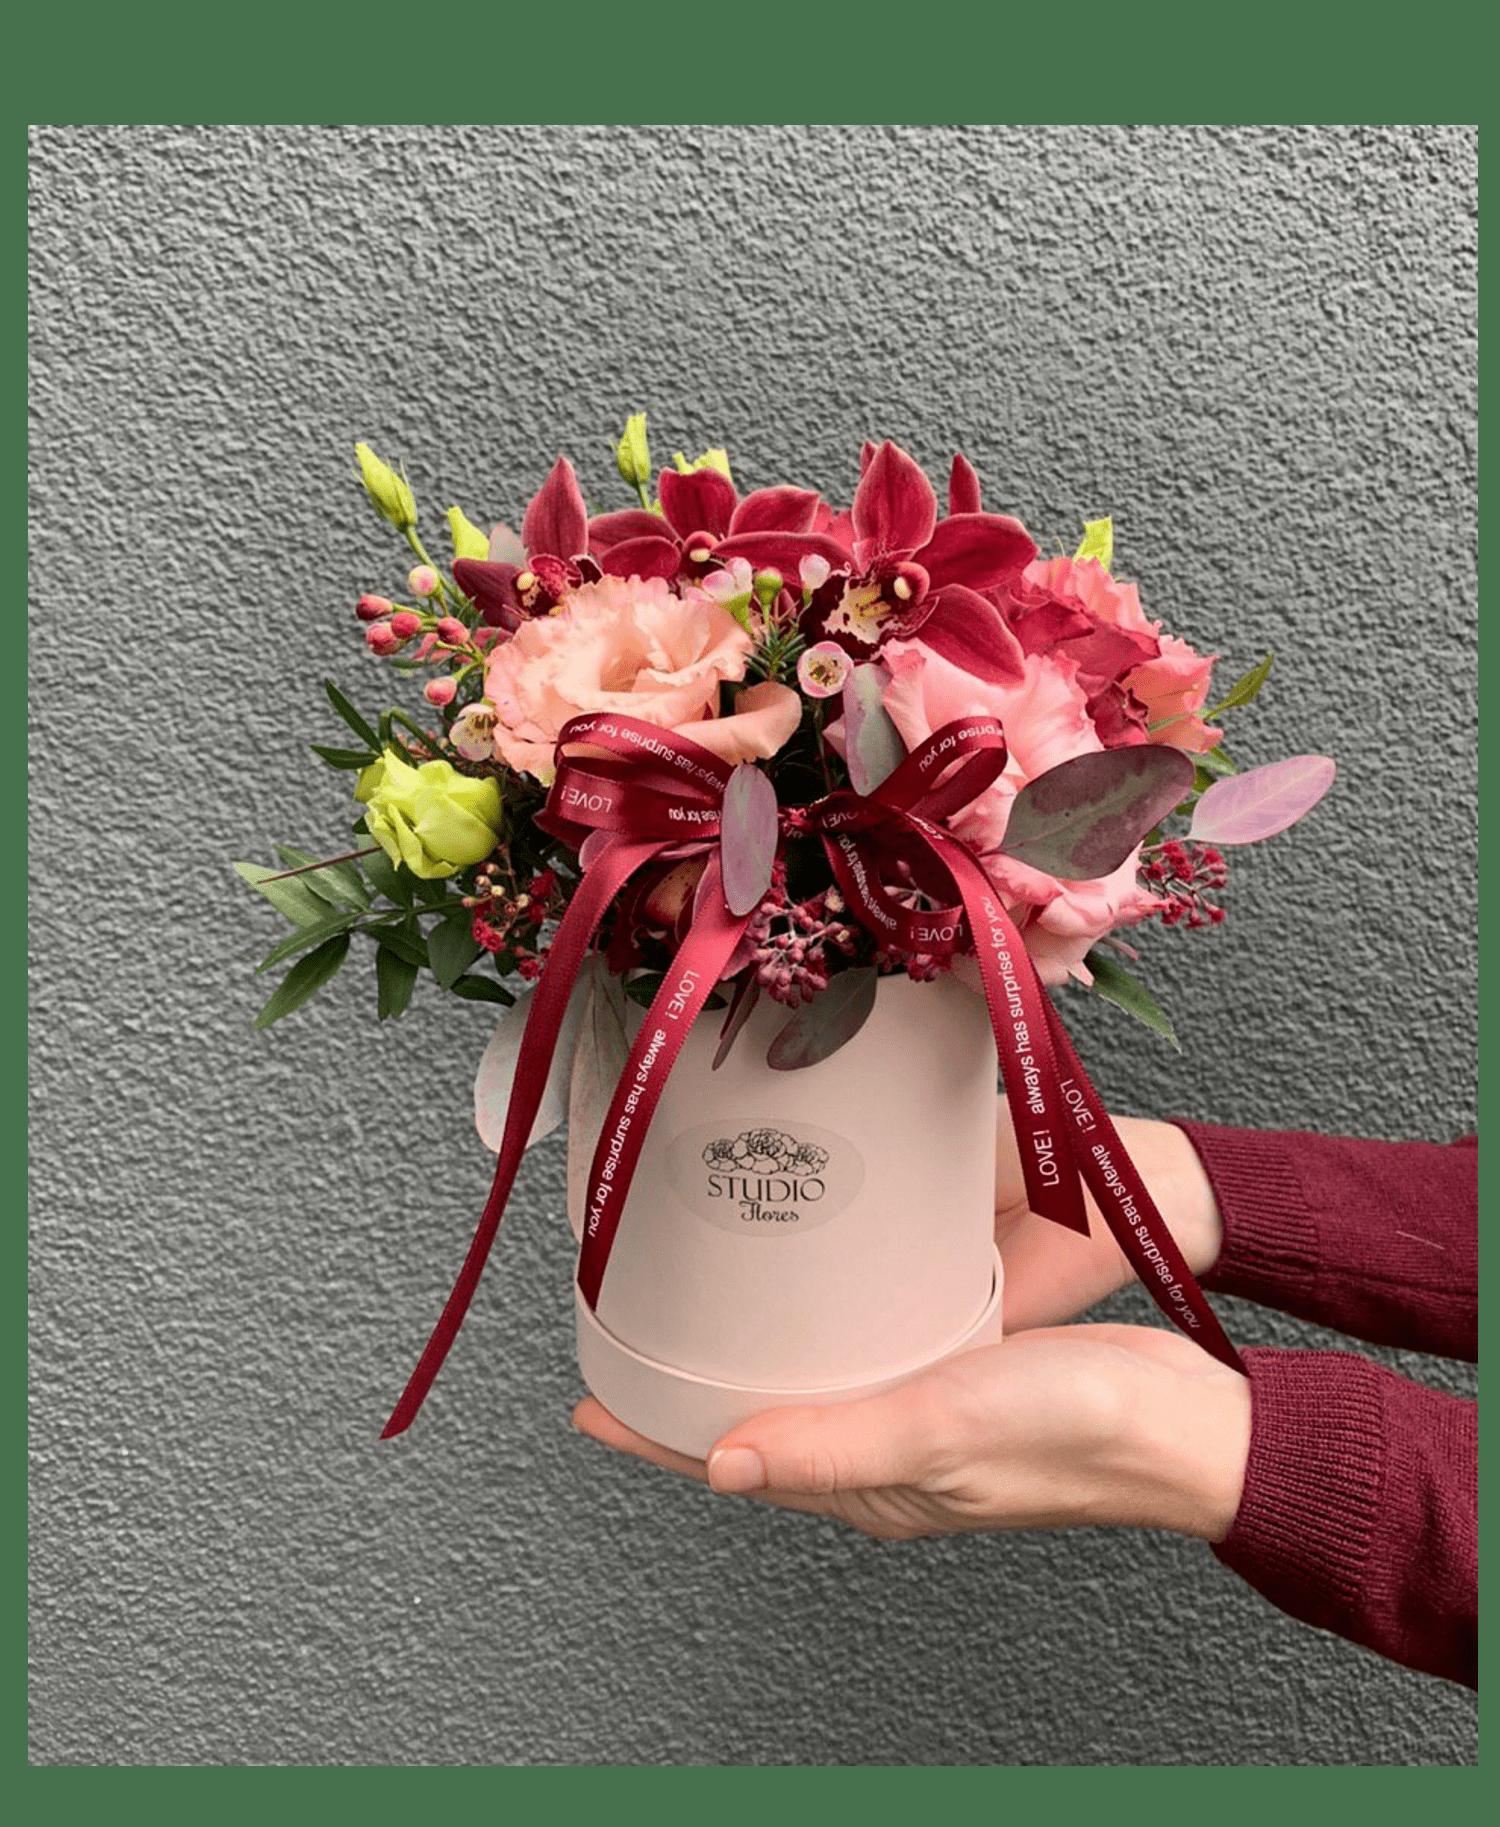 Букет Оттенки марсала – Інтернет-магазин квітів STUDIO Flores